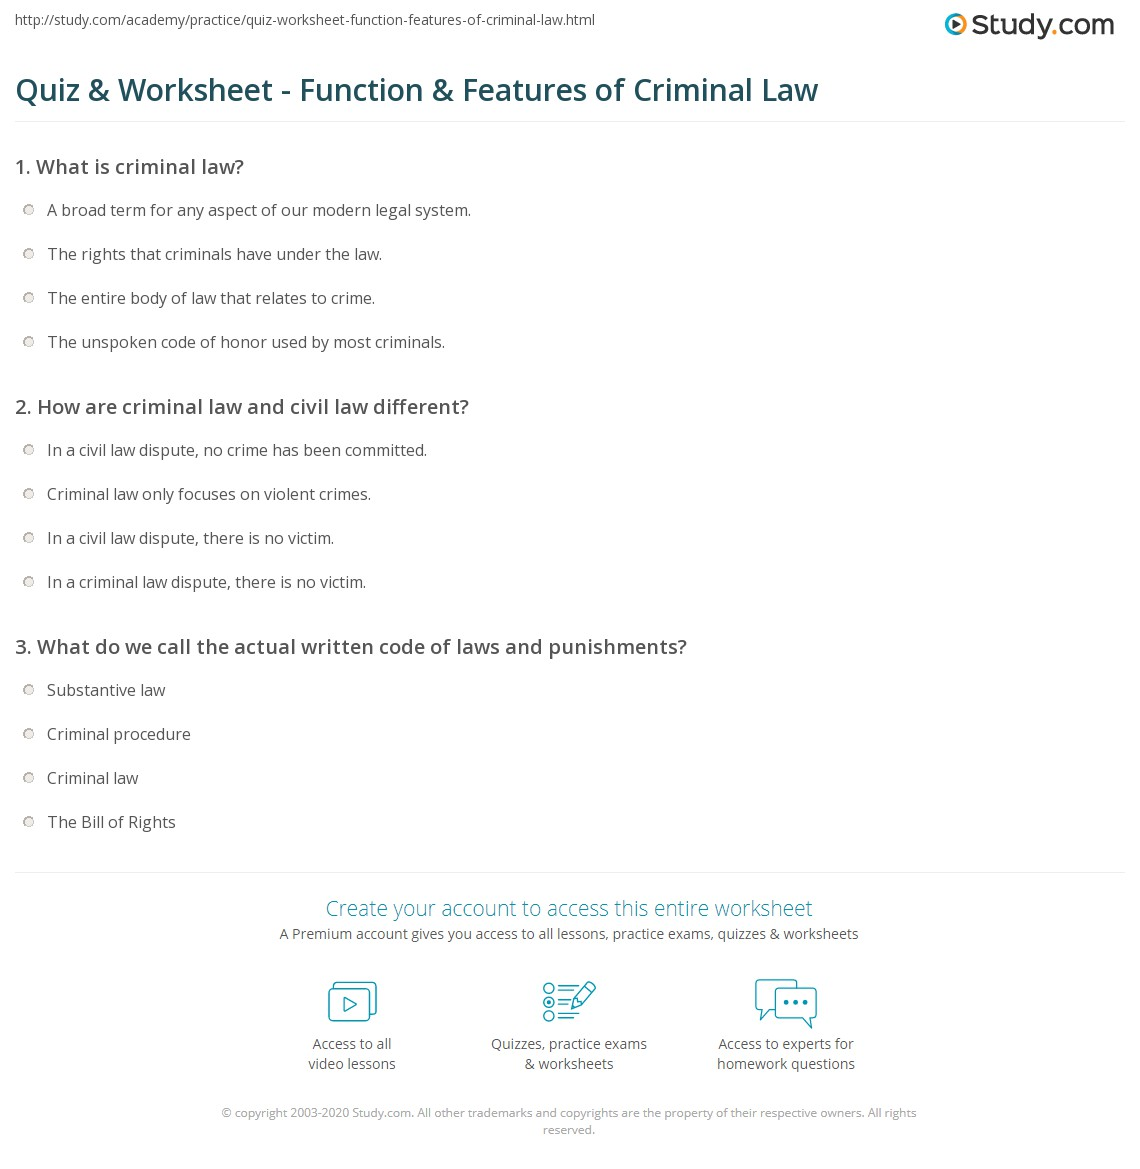 Worksheets Criminal Law Worksheets quiz worksheet function features of criminal law study com print the nature and purpose worksheet